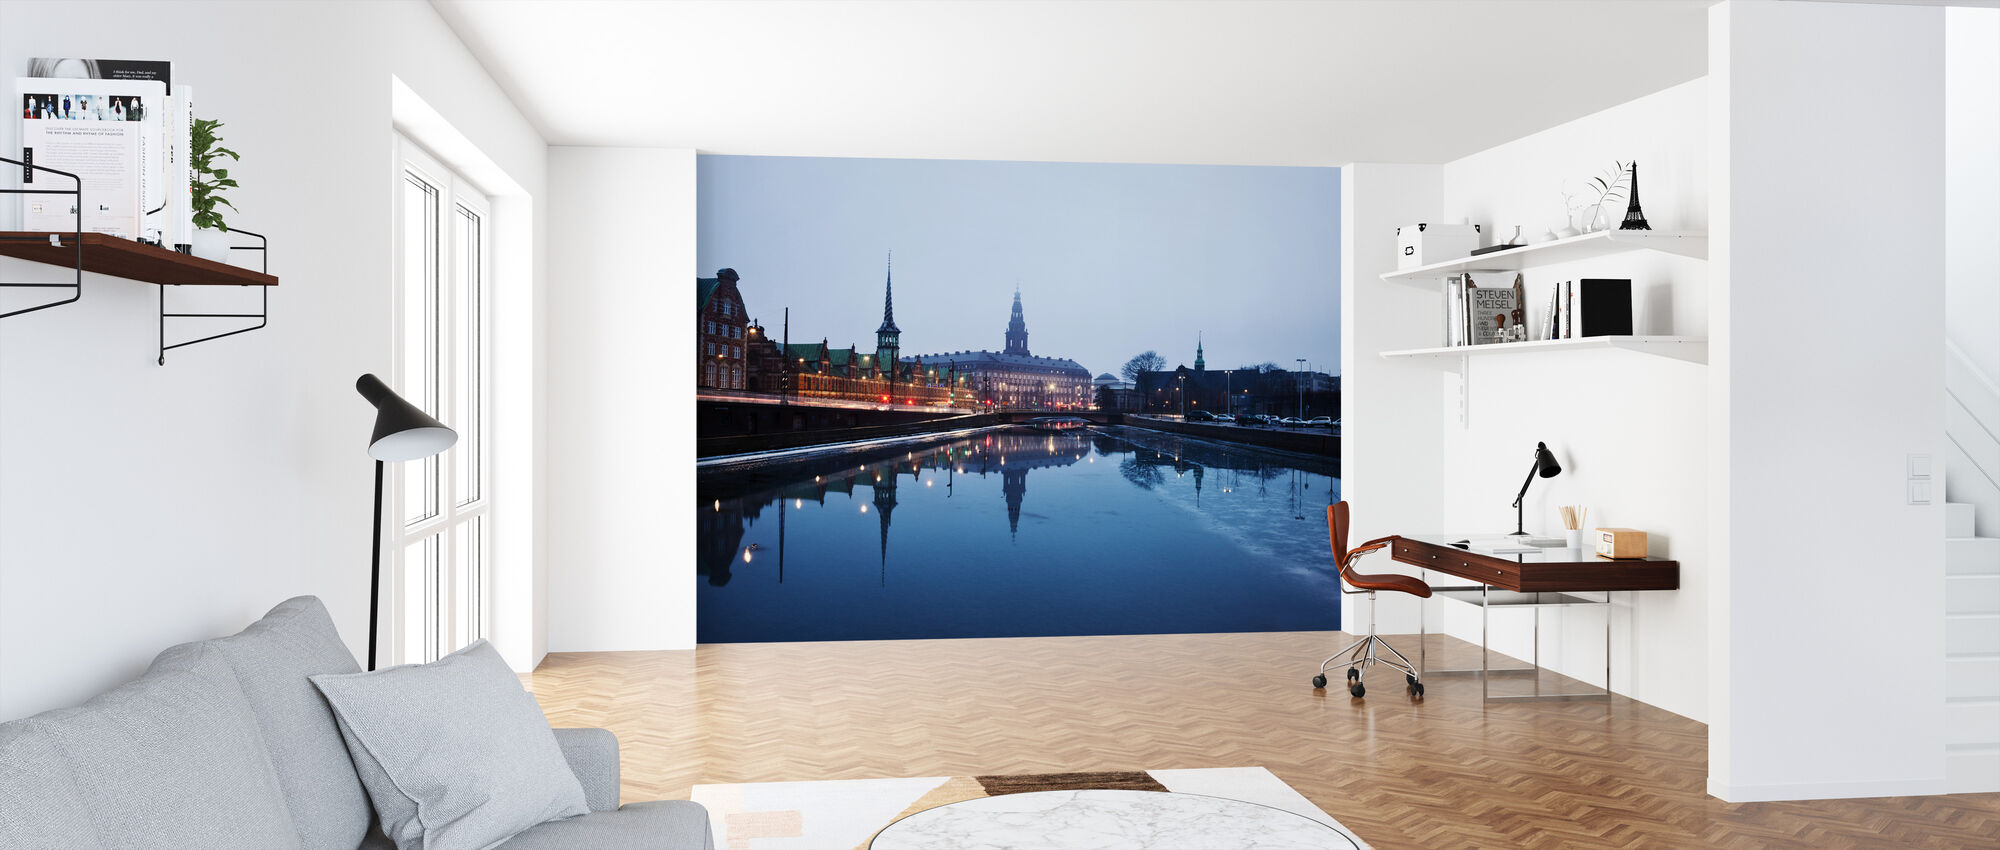 Twilight Copenhagen, Denmark - Wallpaper - Office